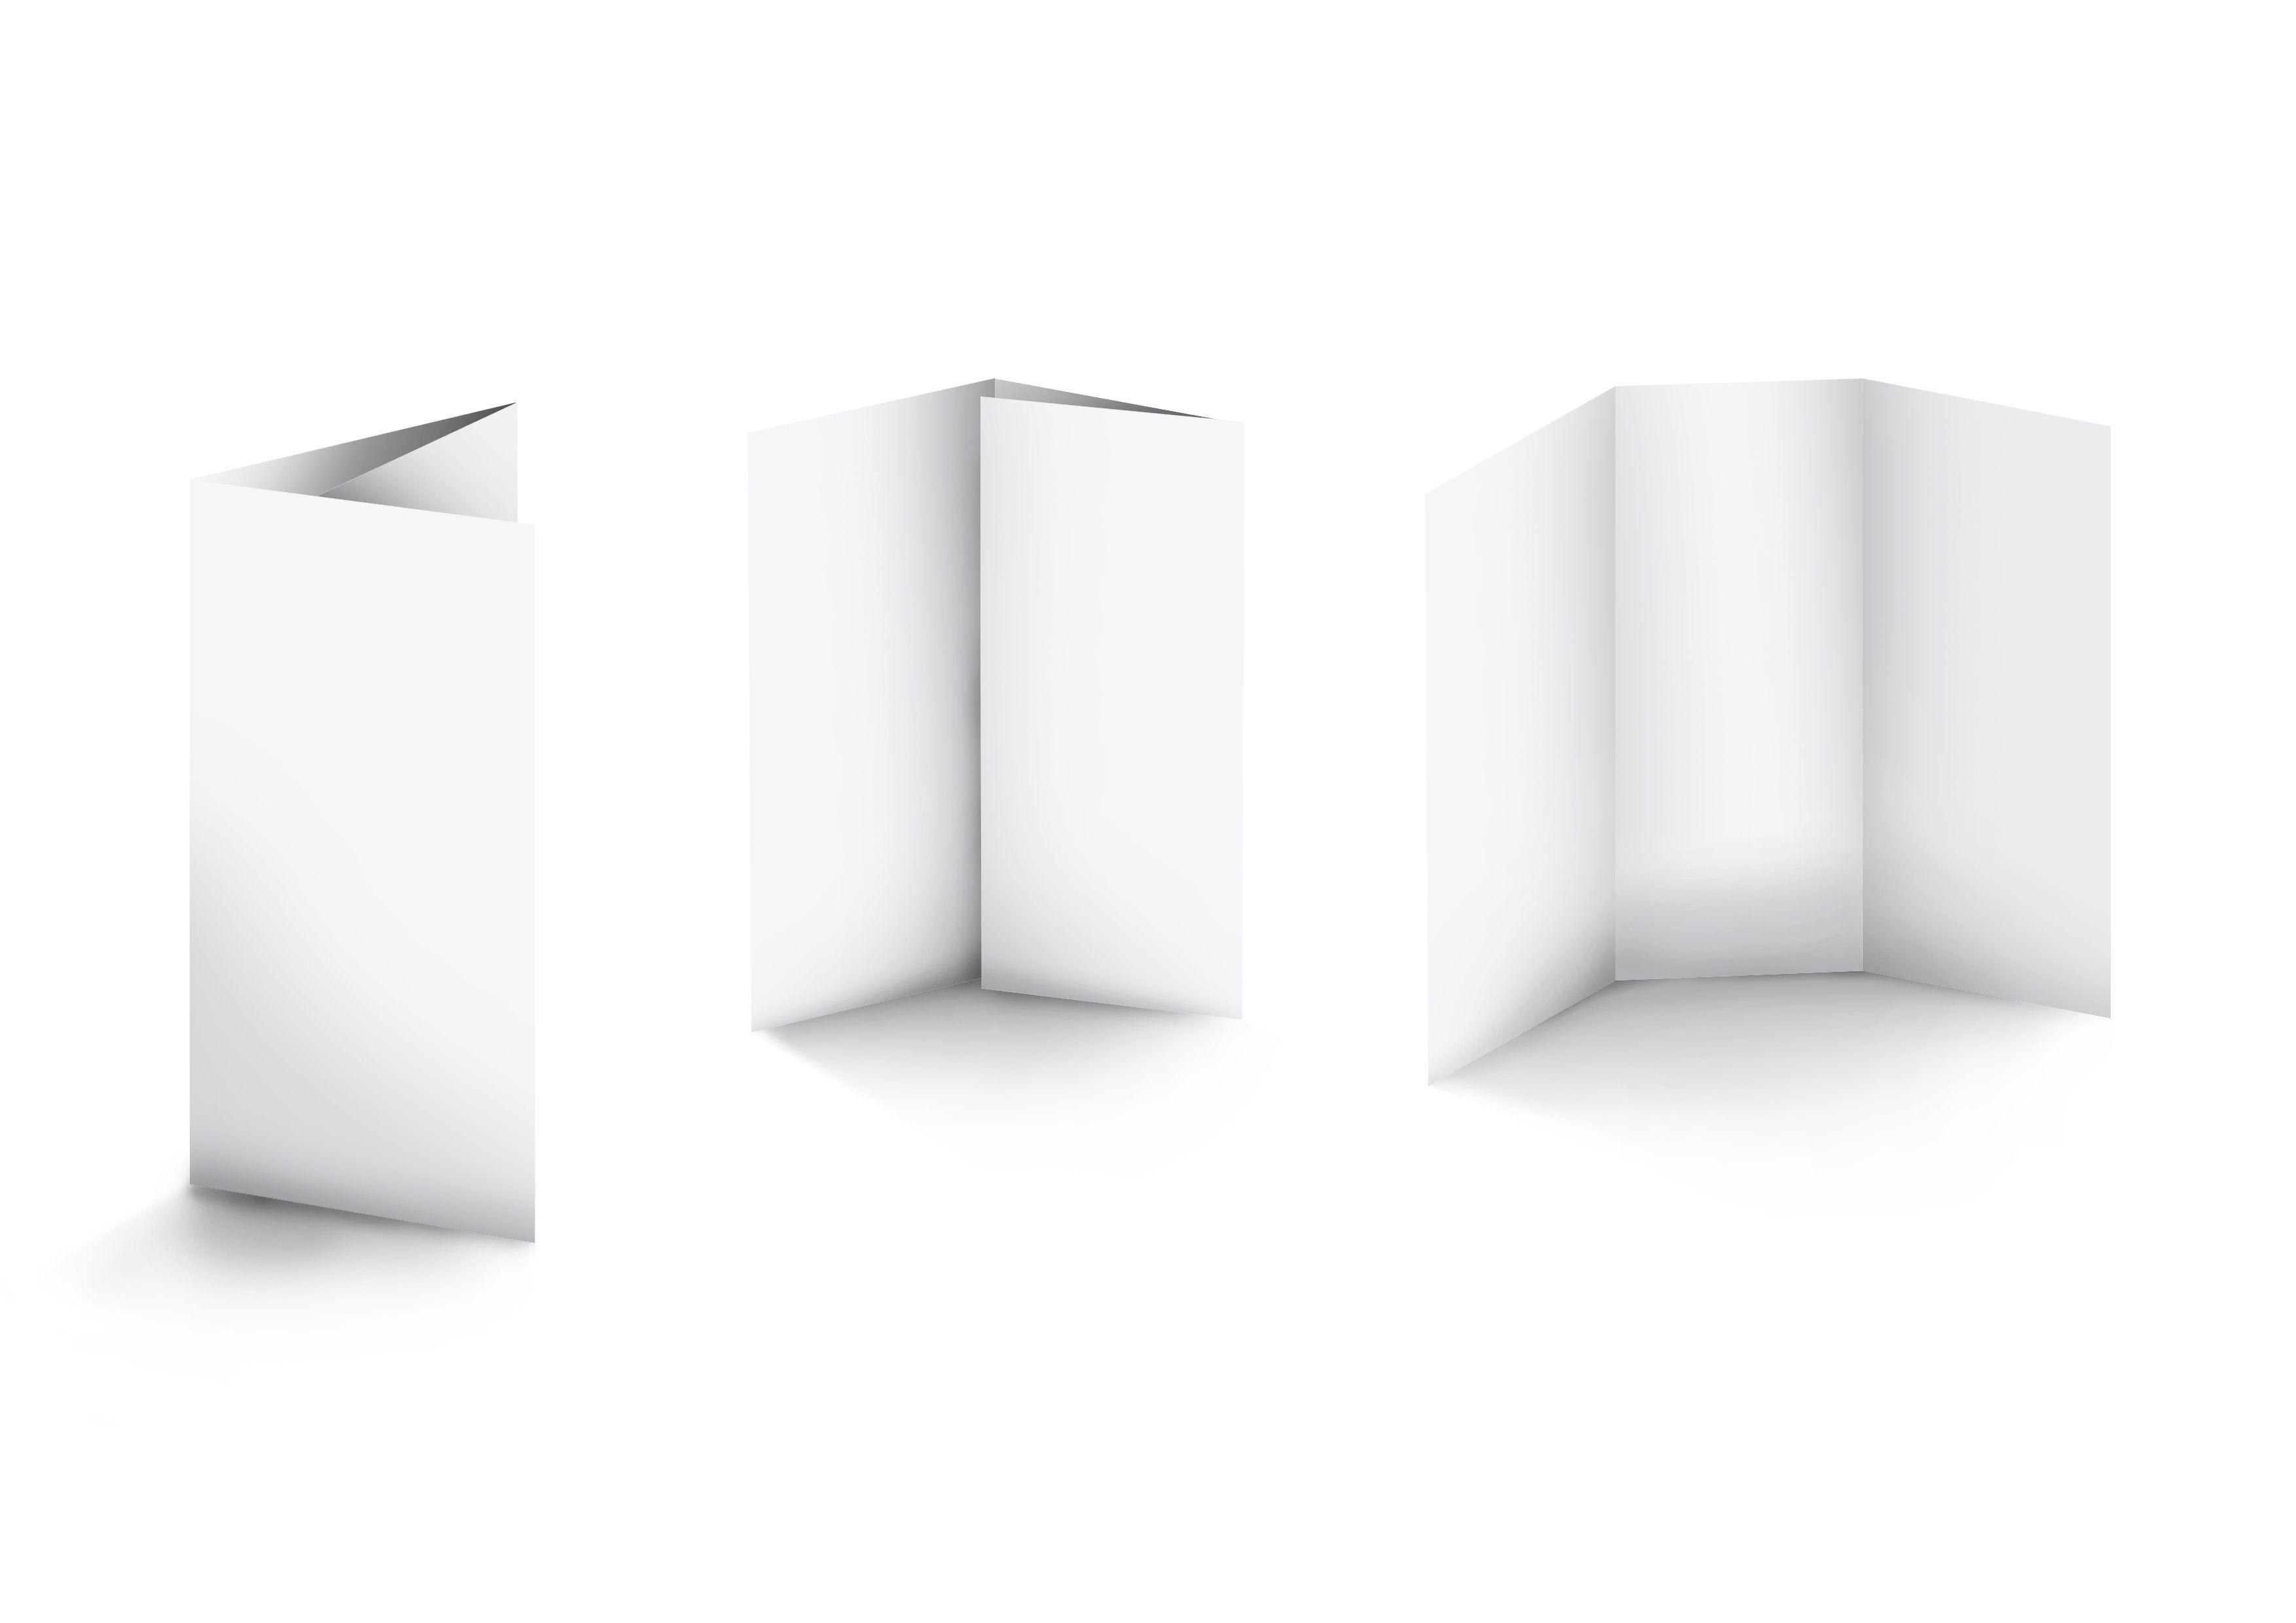 Roll Fold/Tri Fold · Tri Fold Brochure TemplateResume ...  Blank Tri Fold Brochure Template